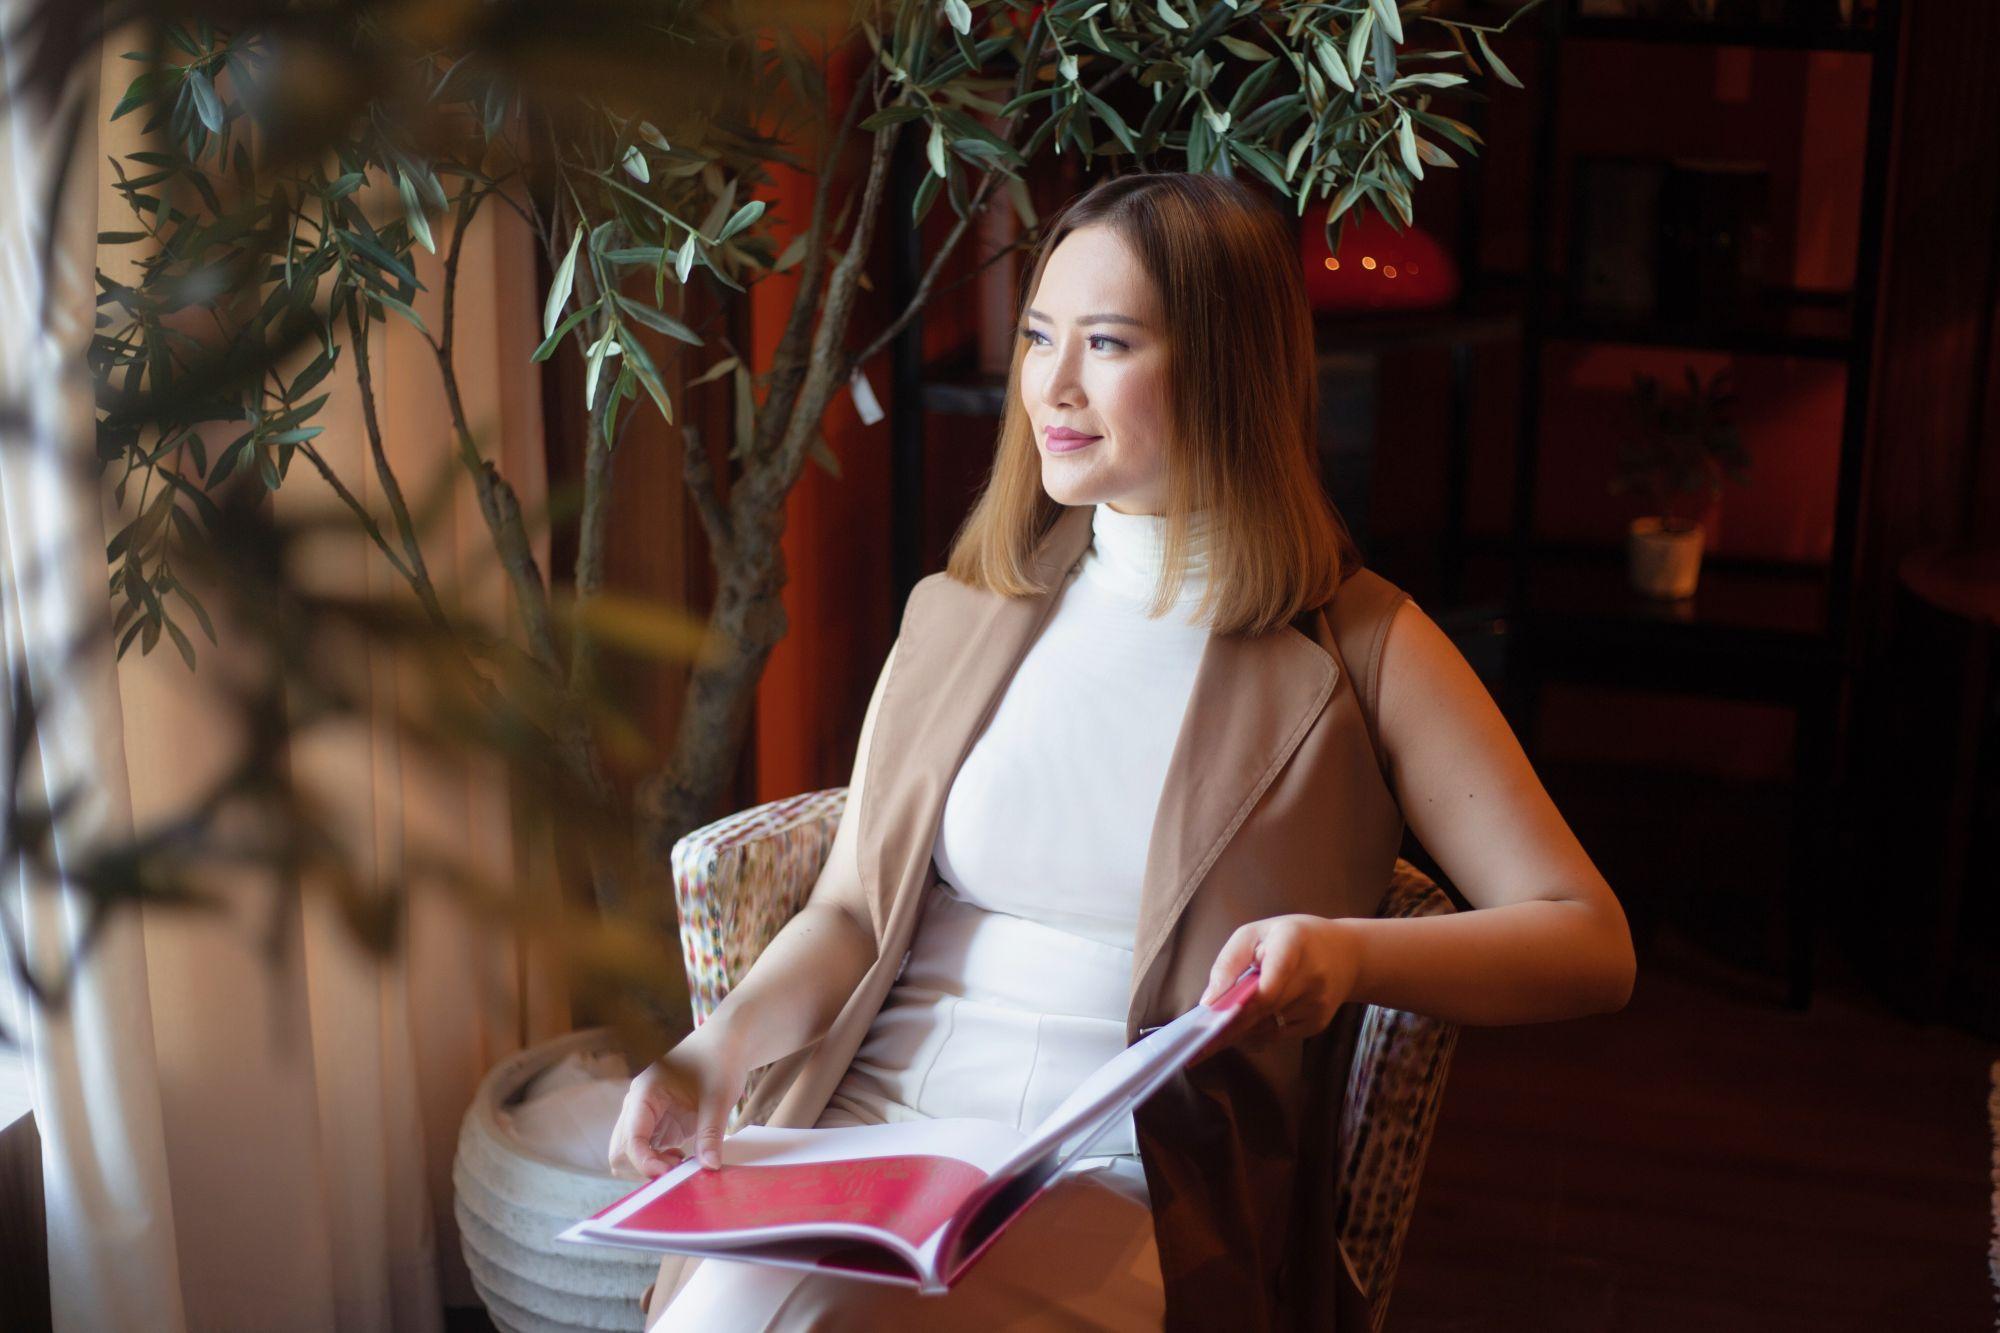 Veteran Recruiter Sabrina Ho Starts An Online Career Platform Just For Women In Asia